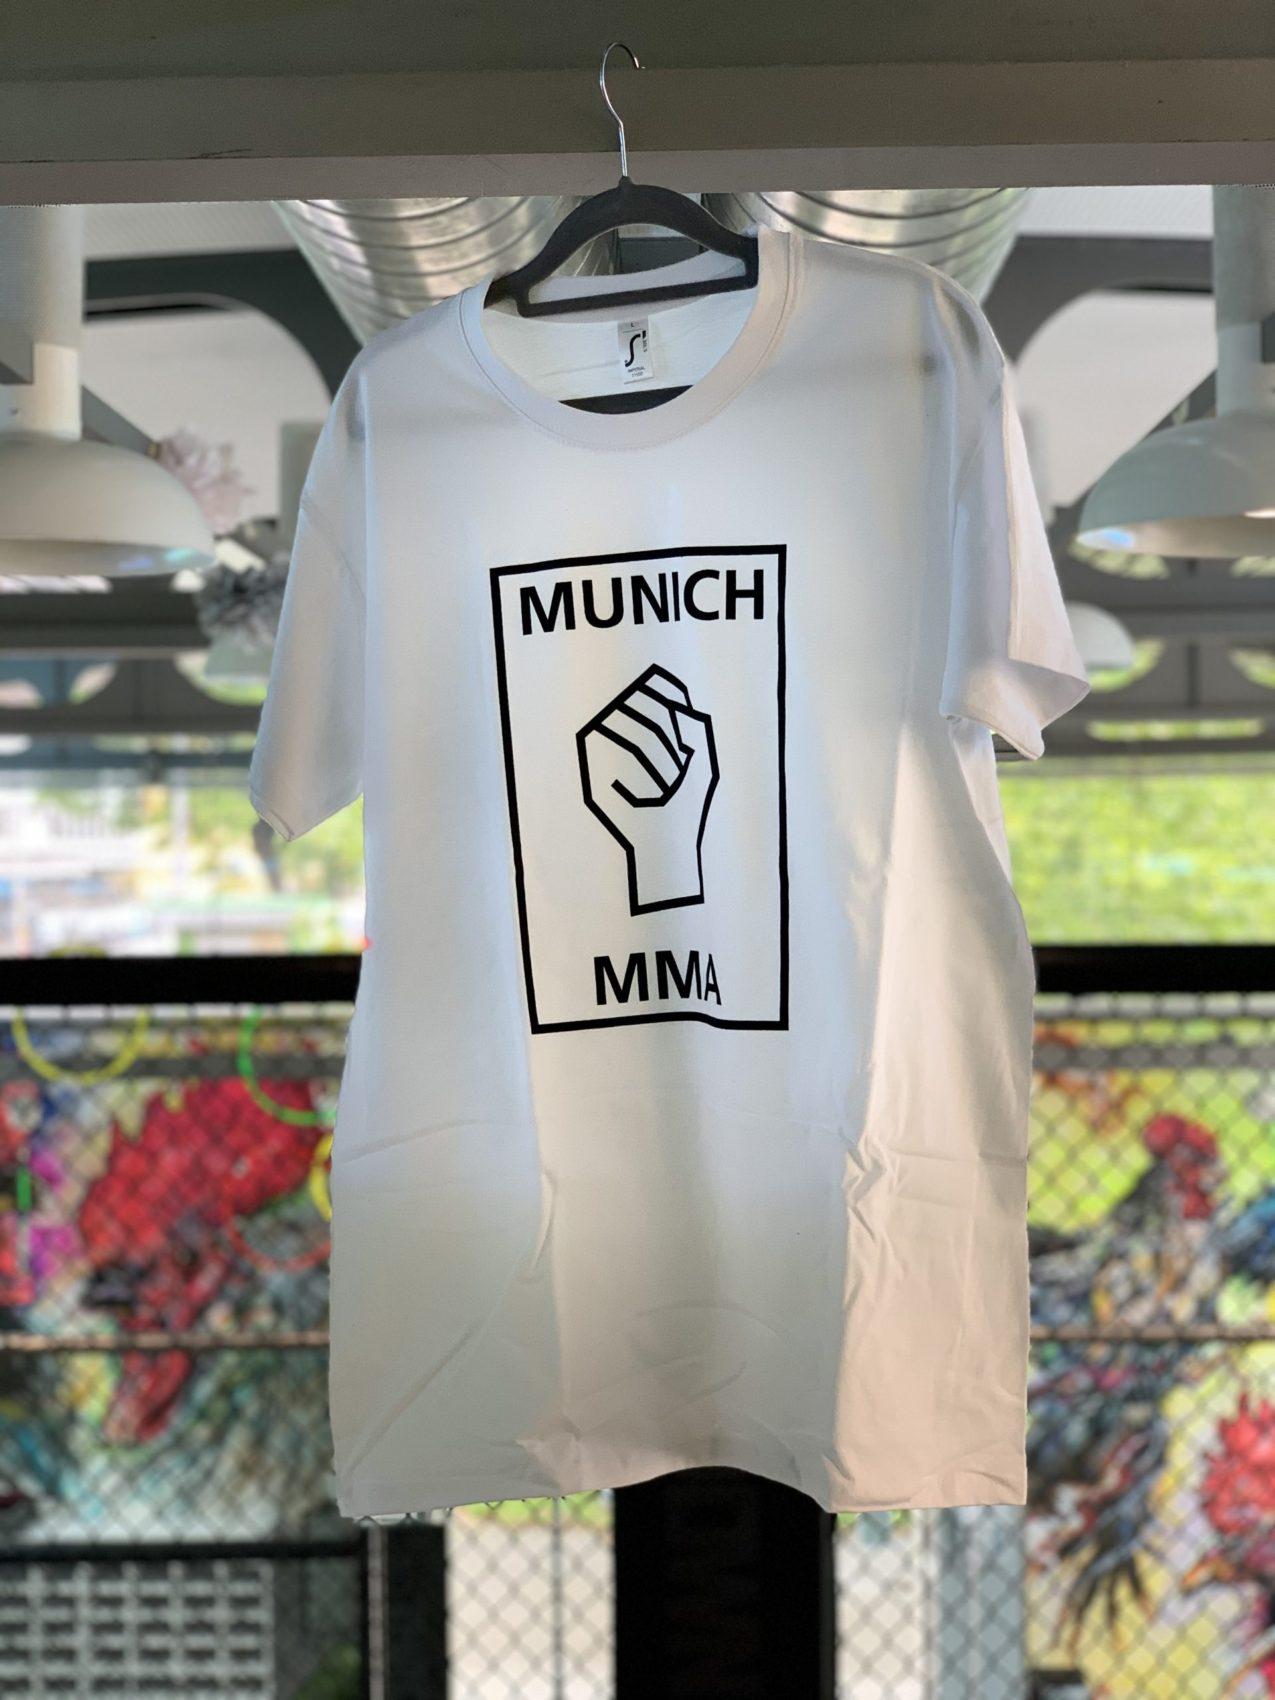 Munich MMA Team T-Shirt weiss mit Logo